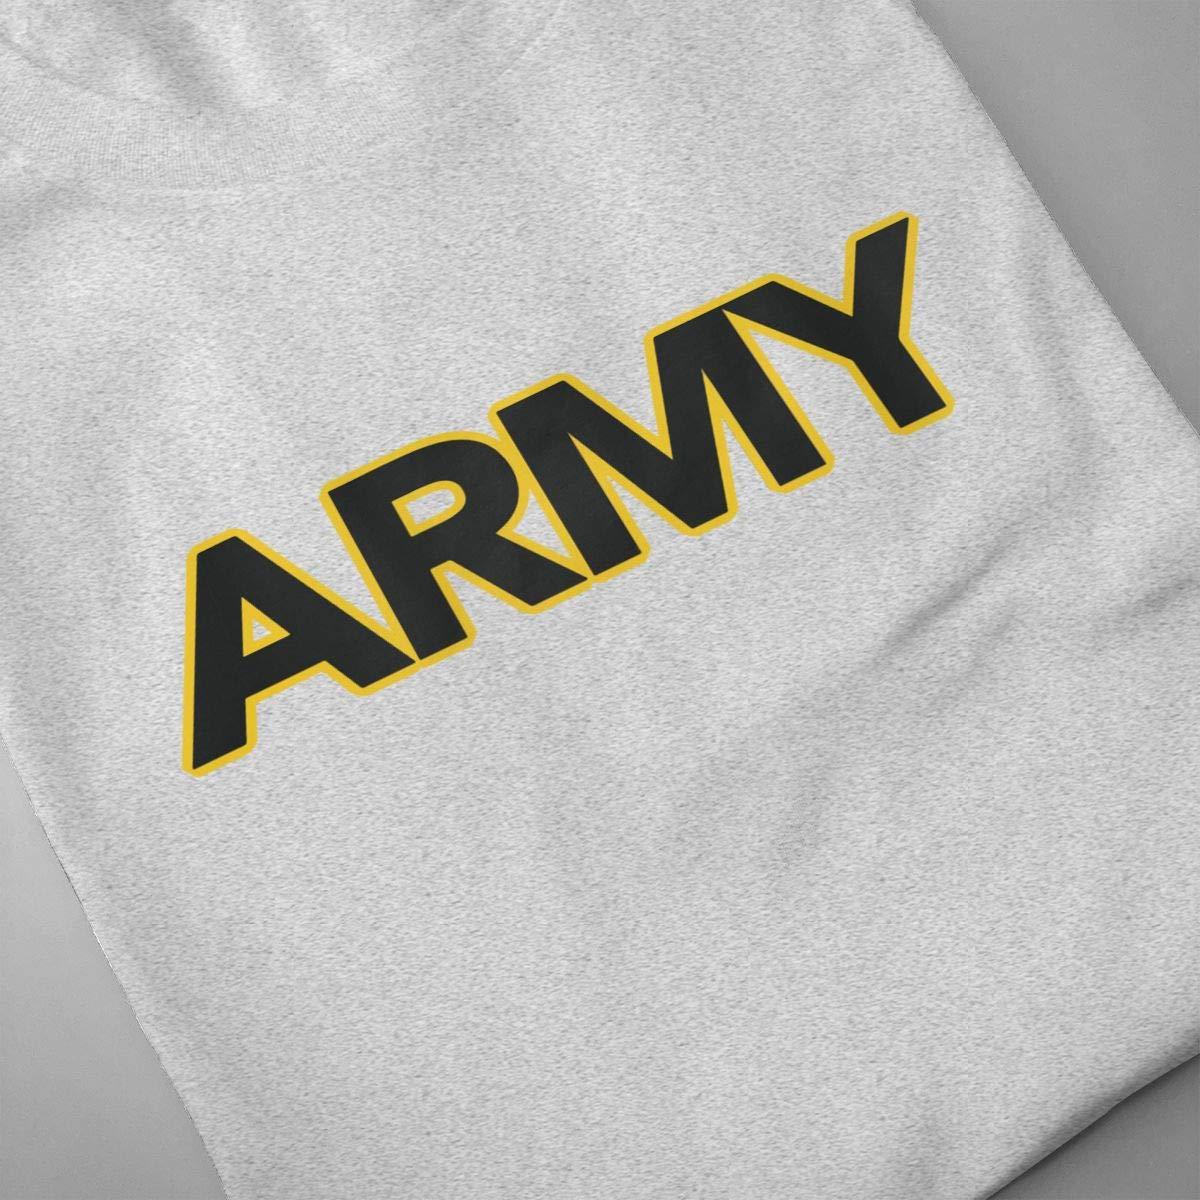 PatriciaMRoach Army LogoMen Fashion Short Sleeve T-Shirt